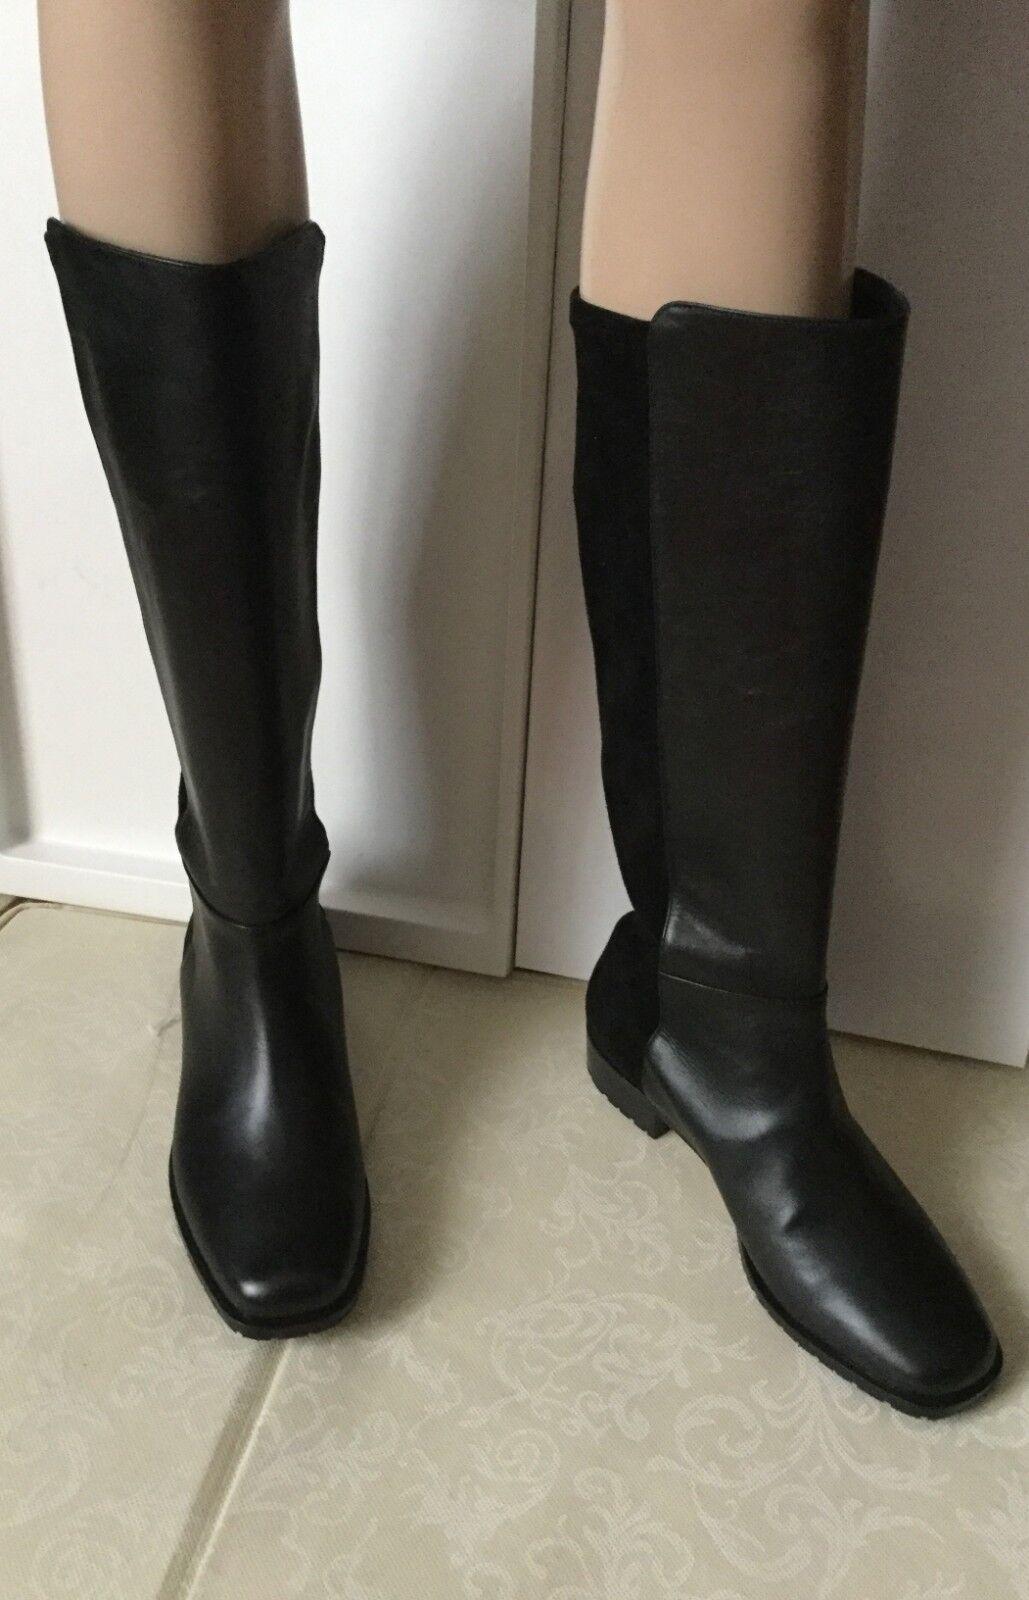 Fantastic boots MaxMara Woman, Noir  40 color,   40    Stivali  , colore nero 7d32dc